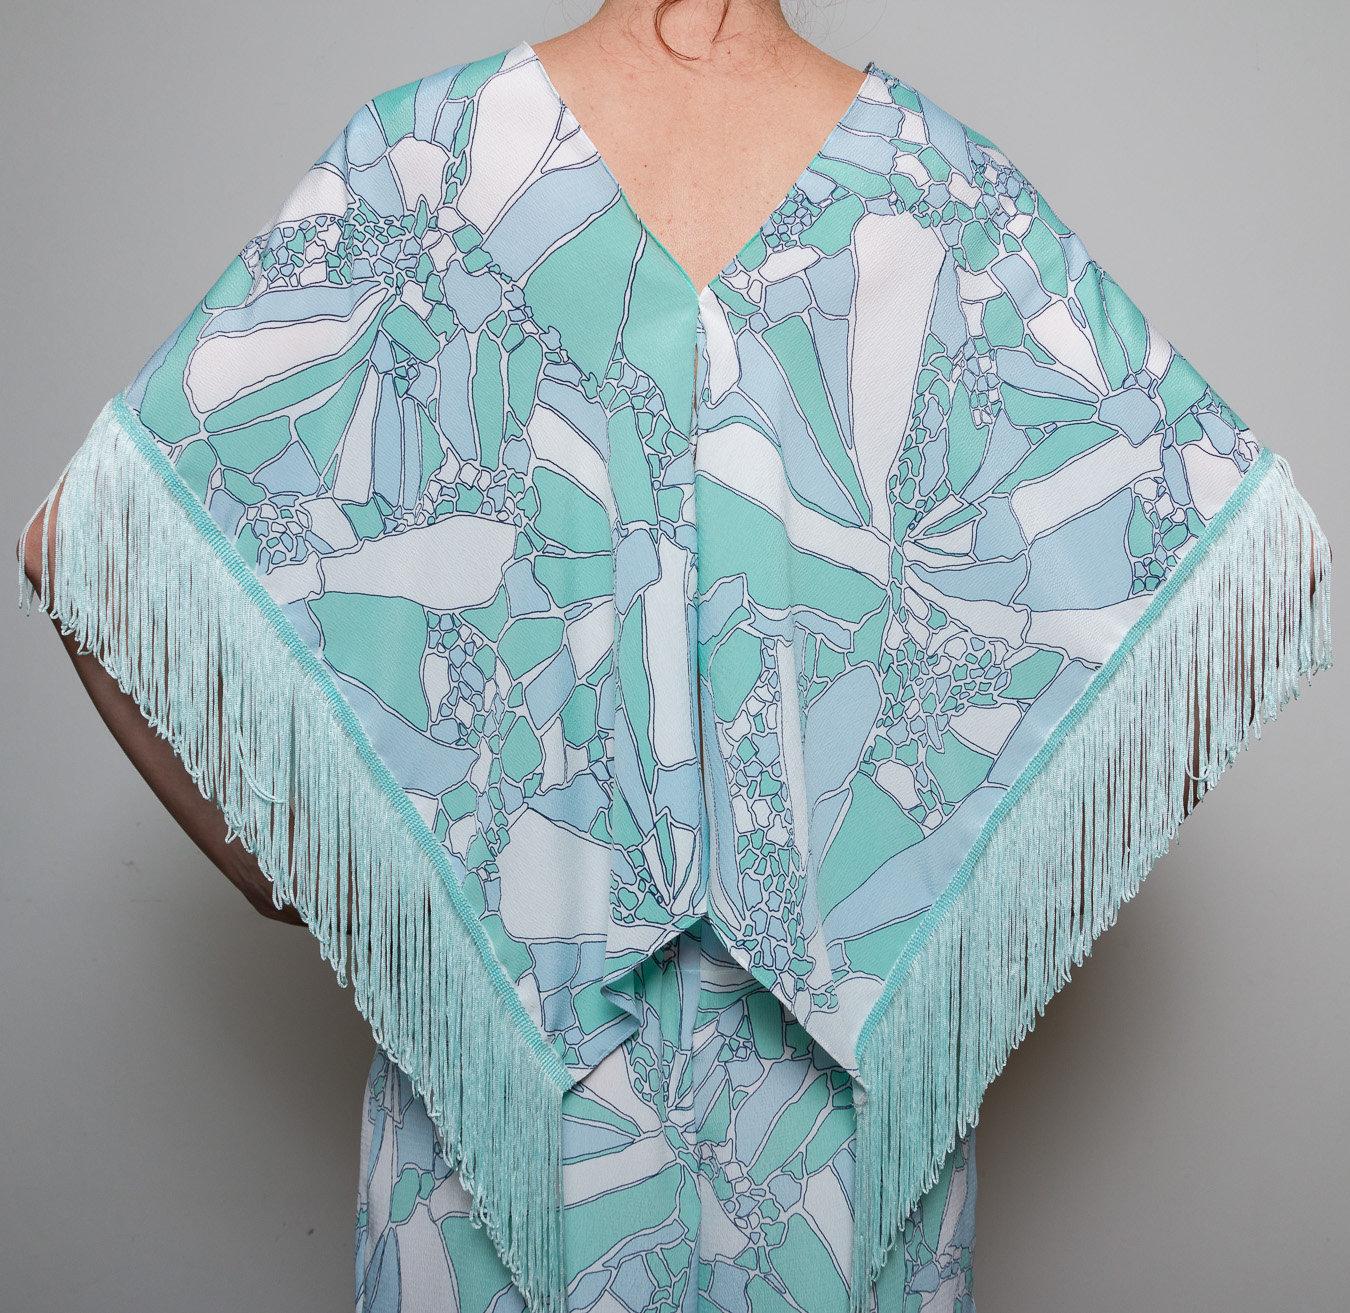 Seidenbluse Kimono Sommer Bluse Lässiger Style